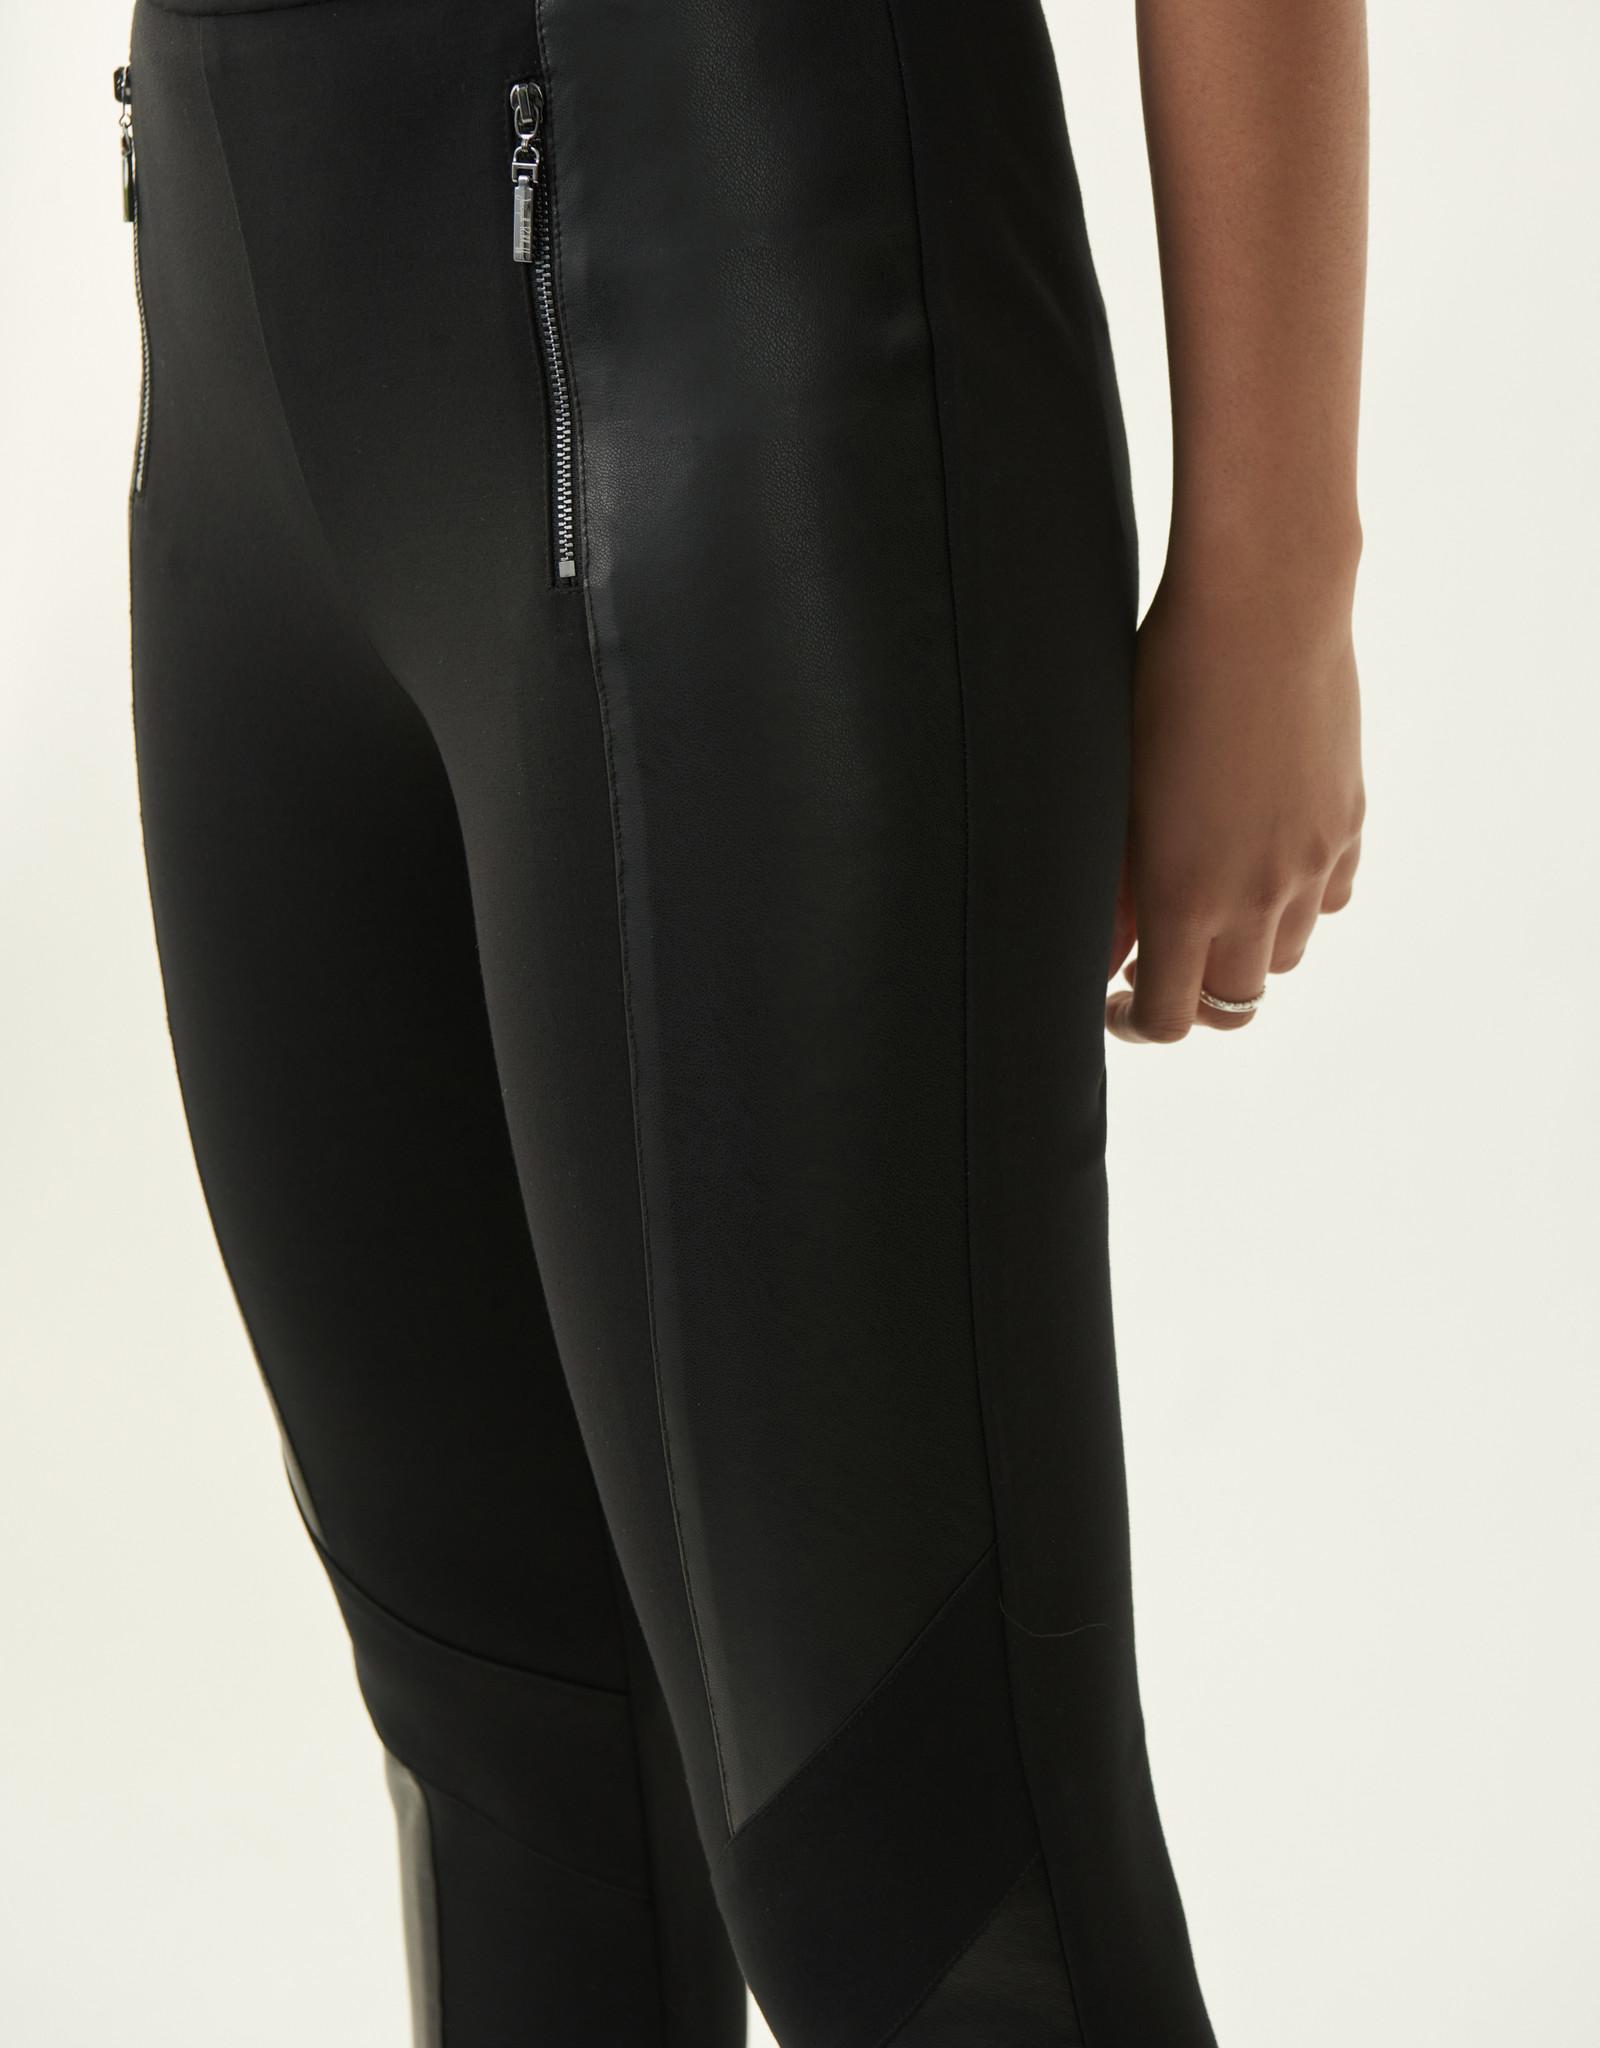 Joseph Ribkoff Joseph Ribkoff pant with leather trim 213385